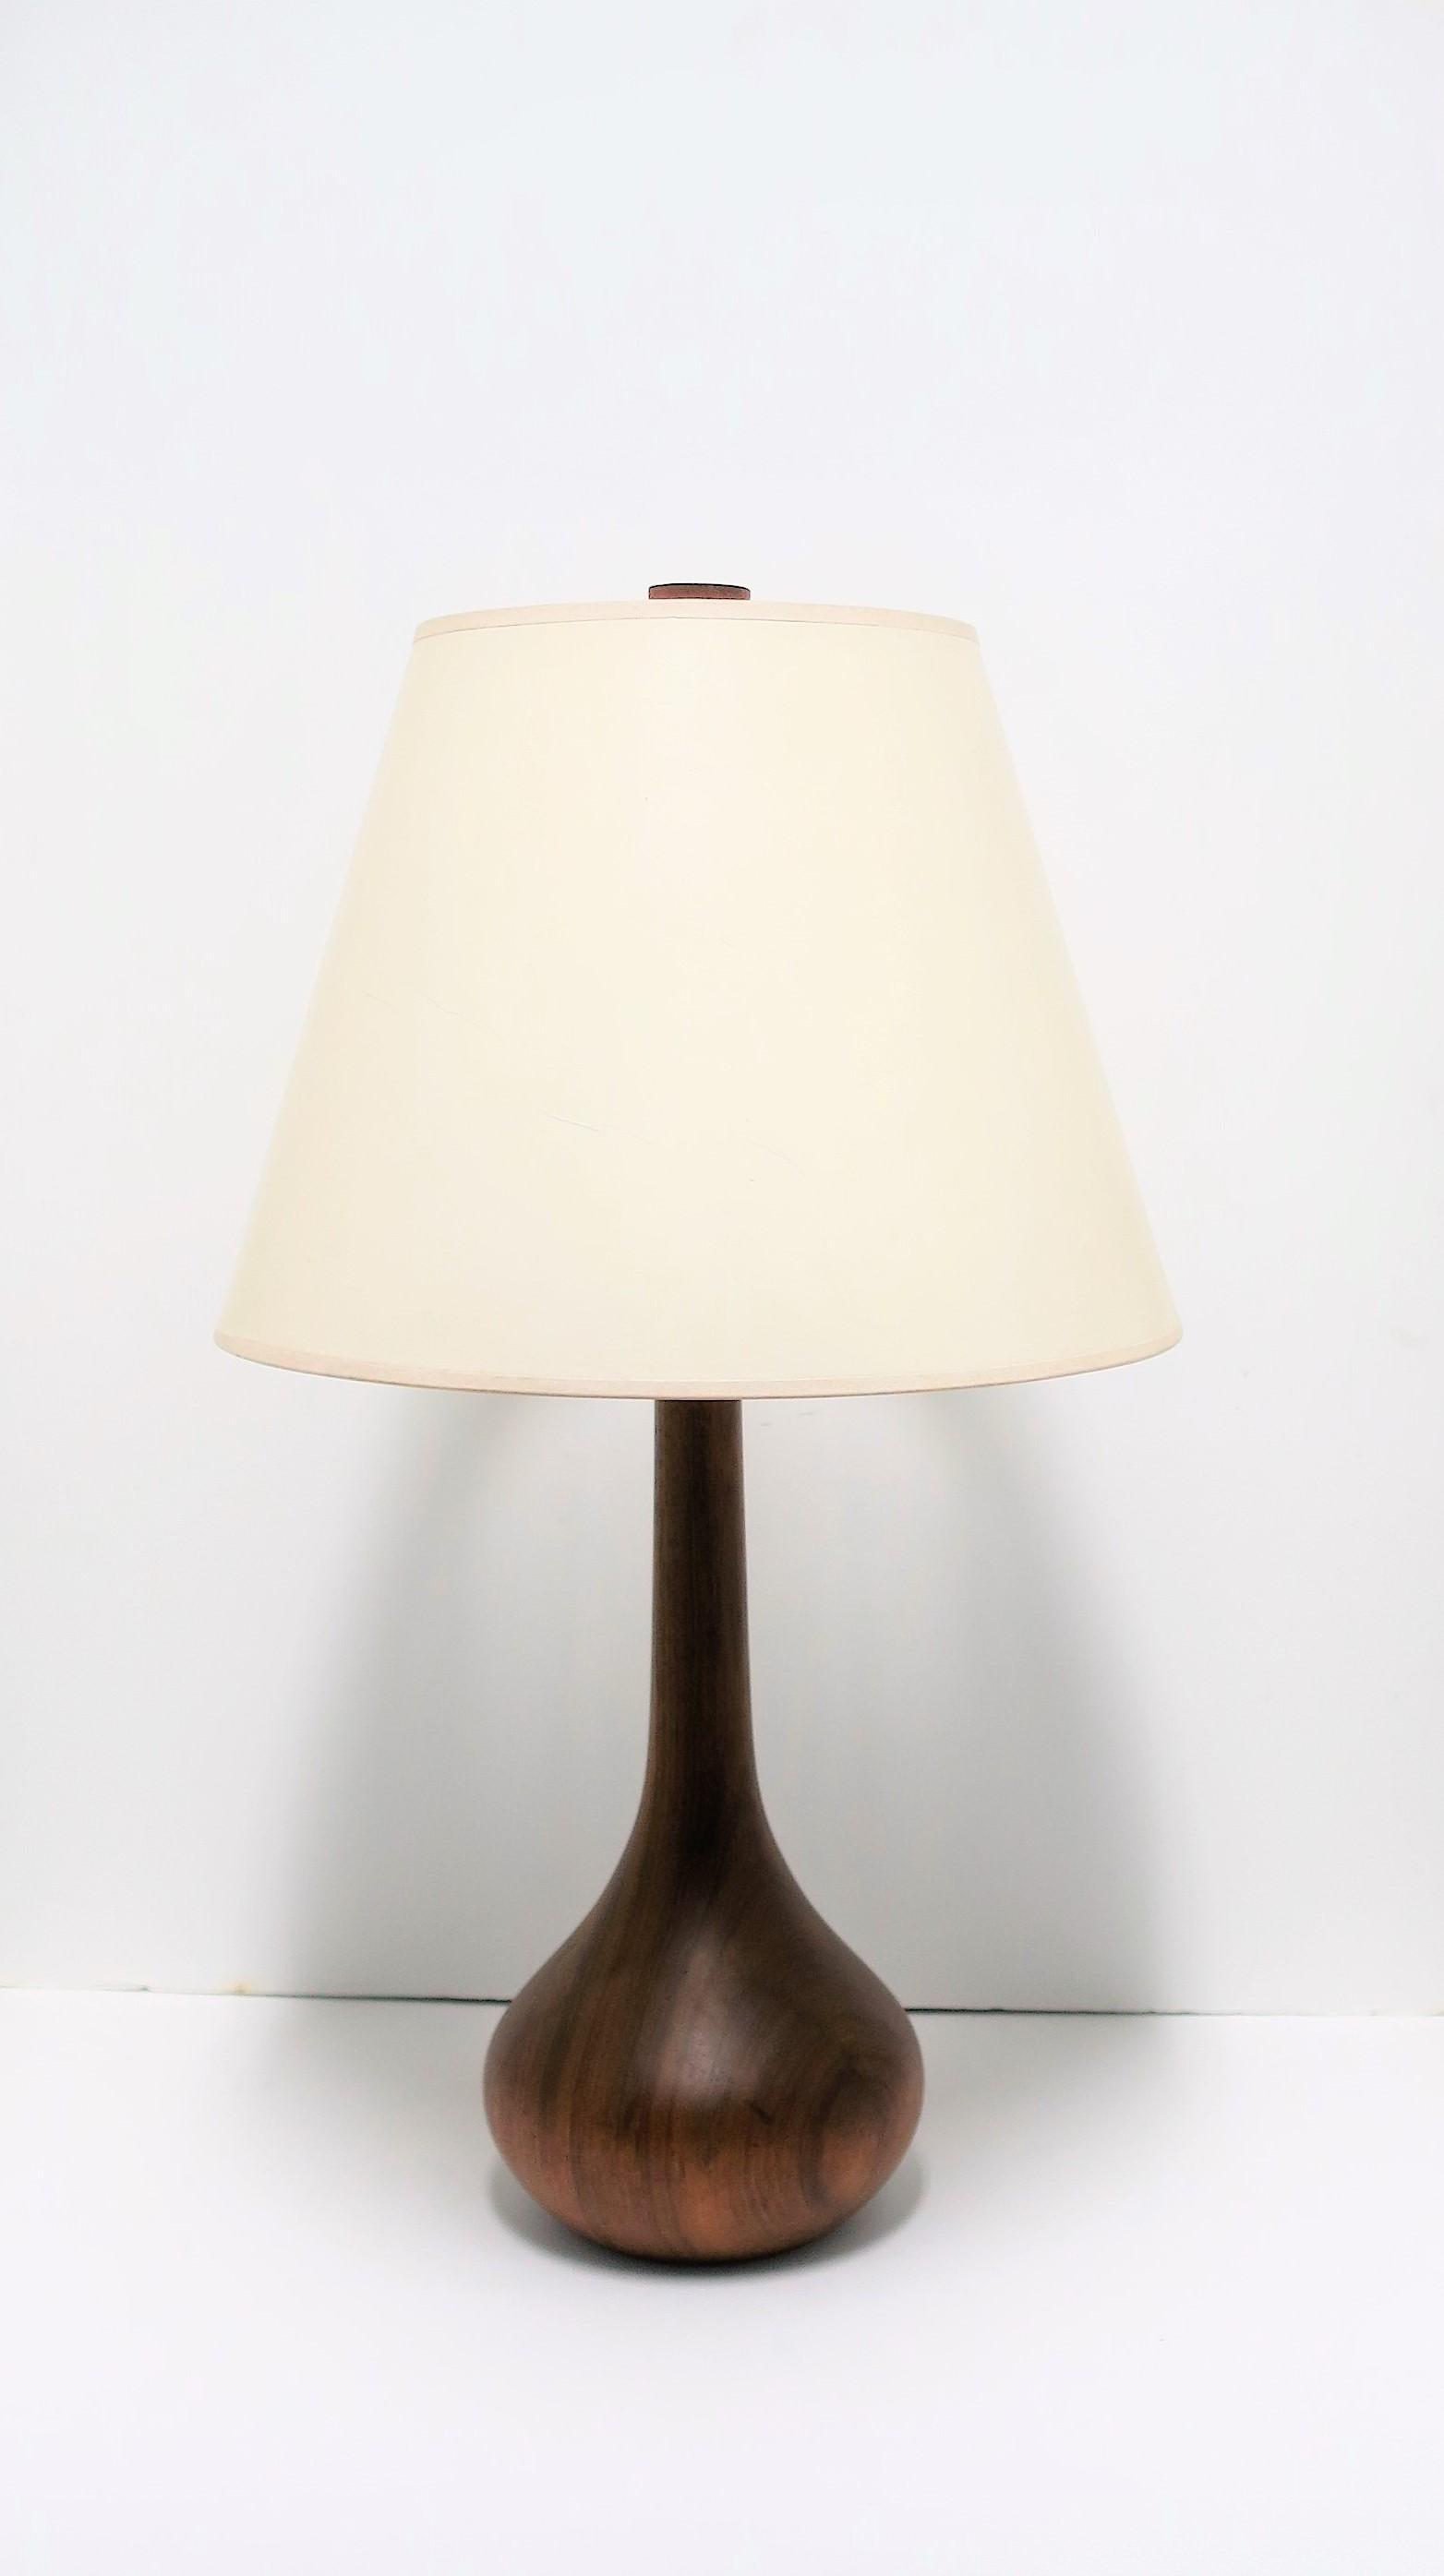 Image of: Scandinavian Modern Wood Table Or Desk Lamp At 1stdibs